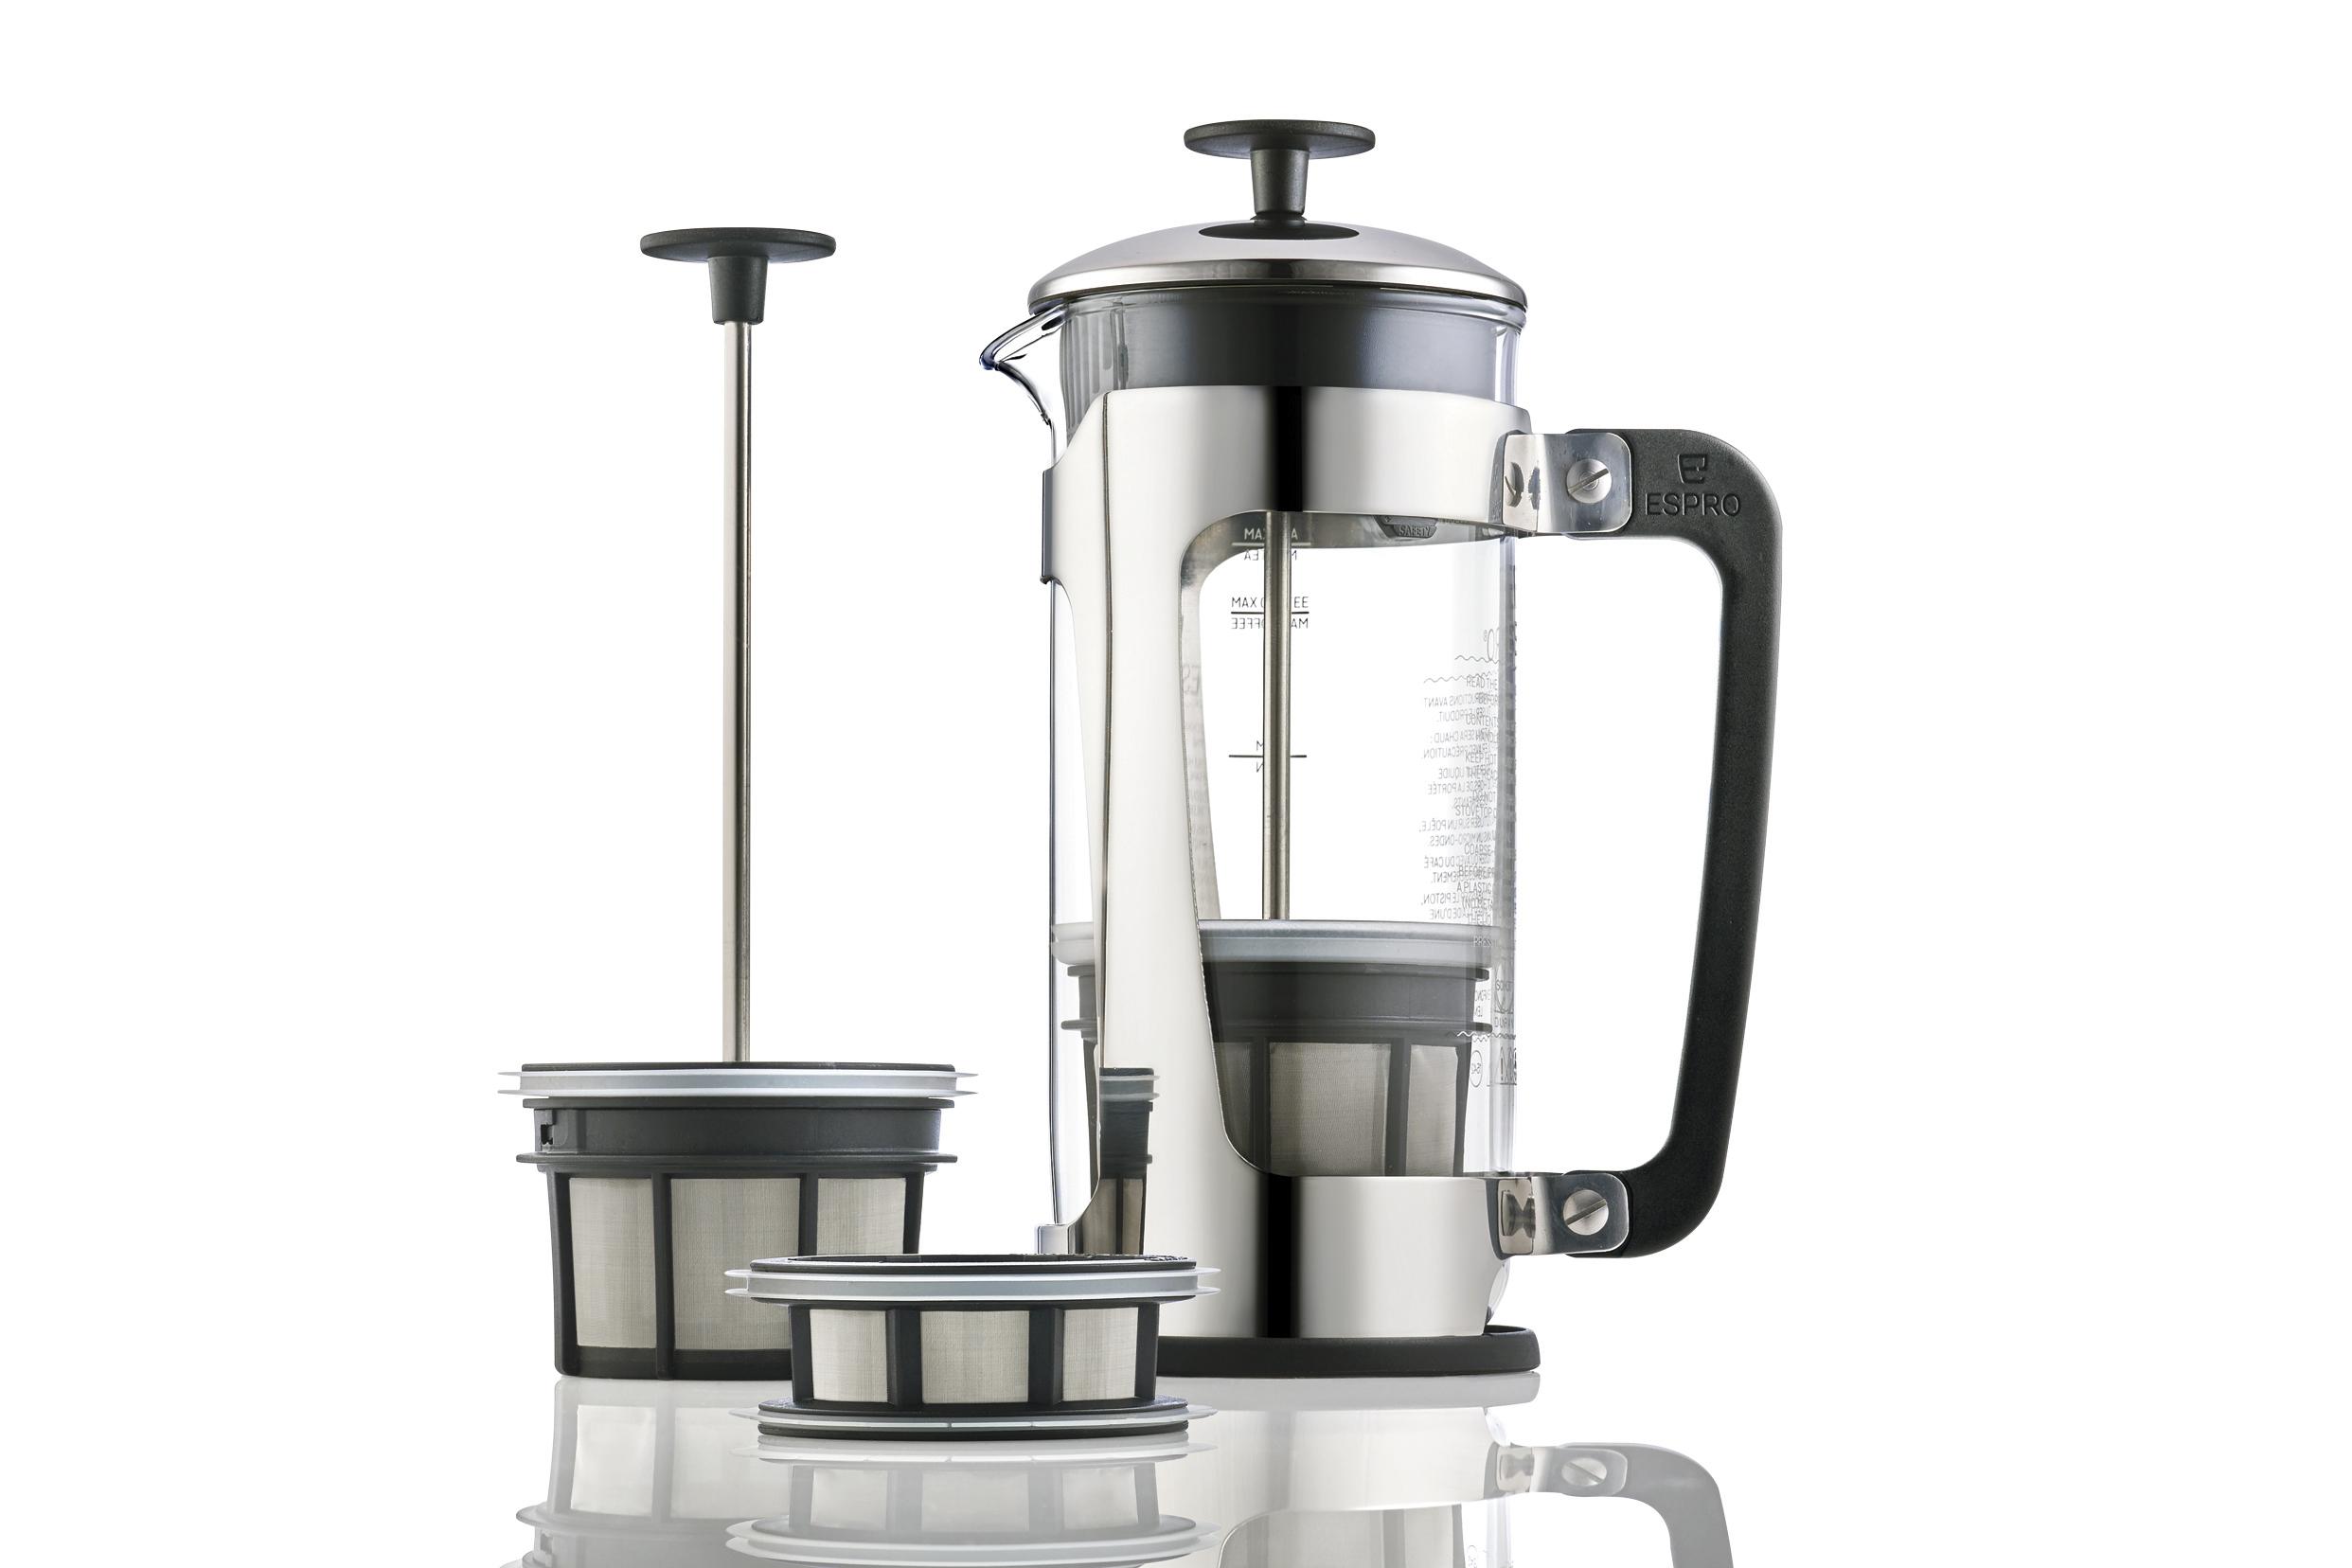 Espro P5 Stempelkande 4 kop, stål/glass, kaffe